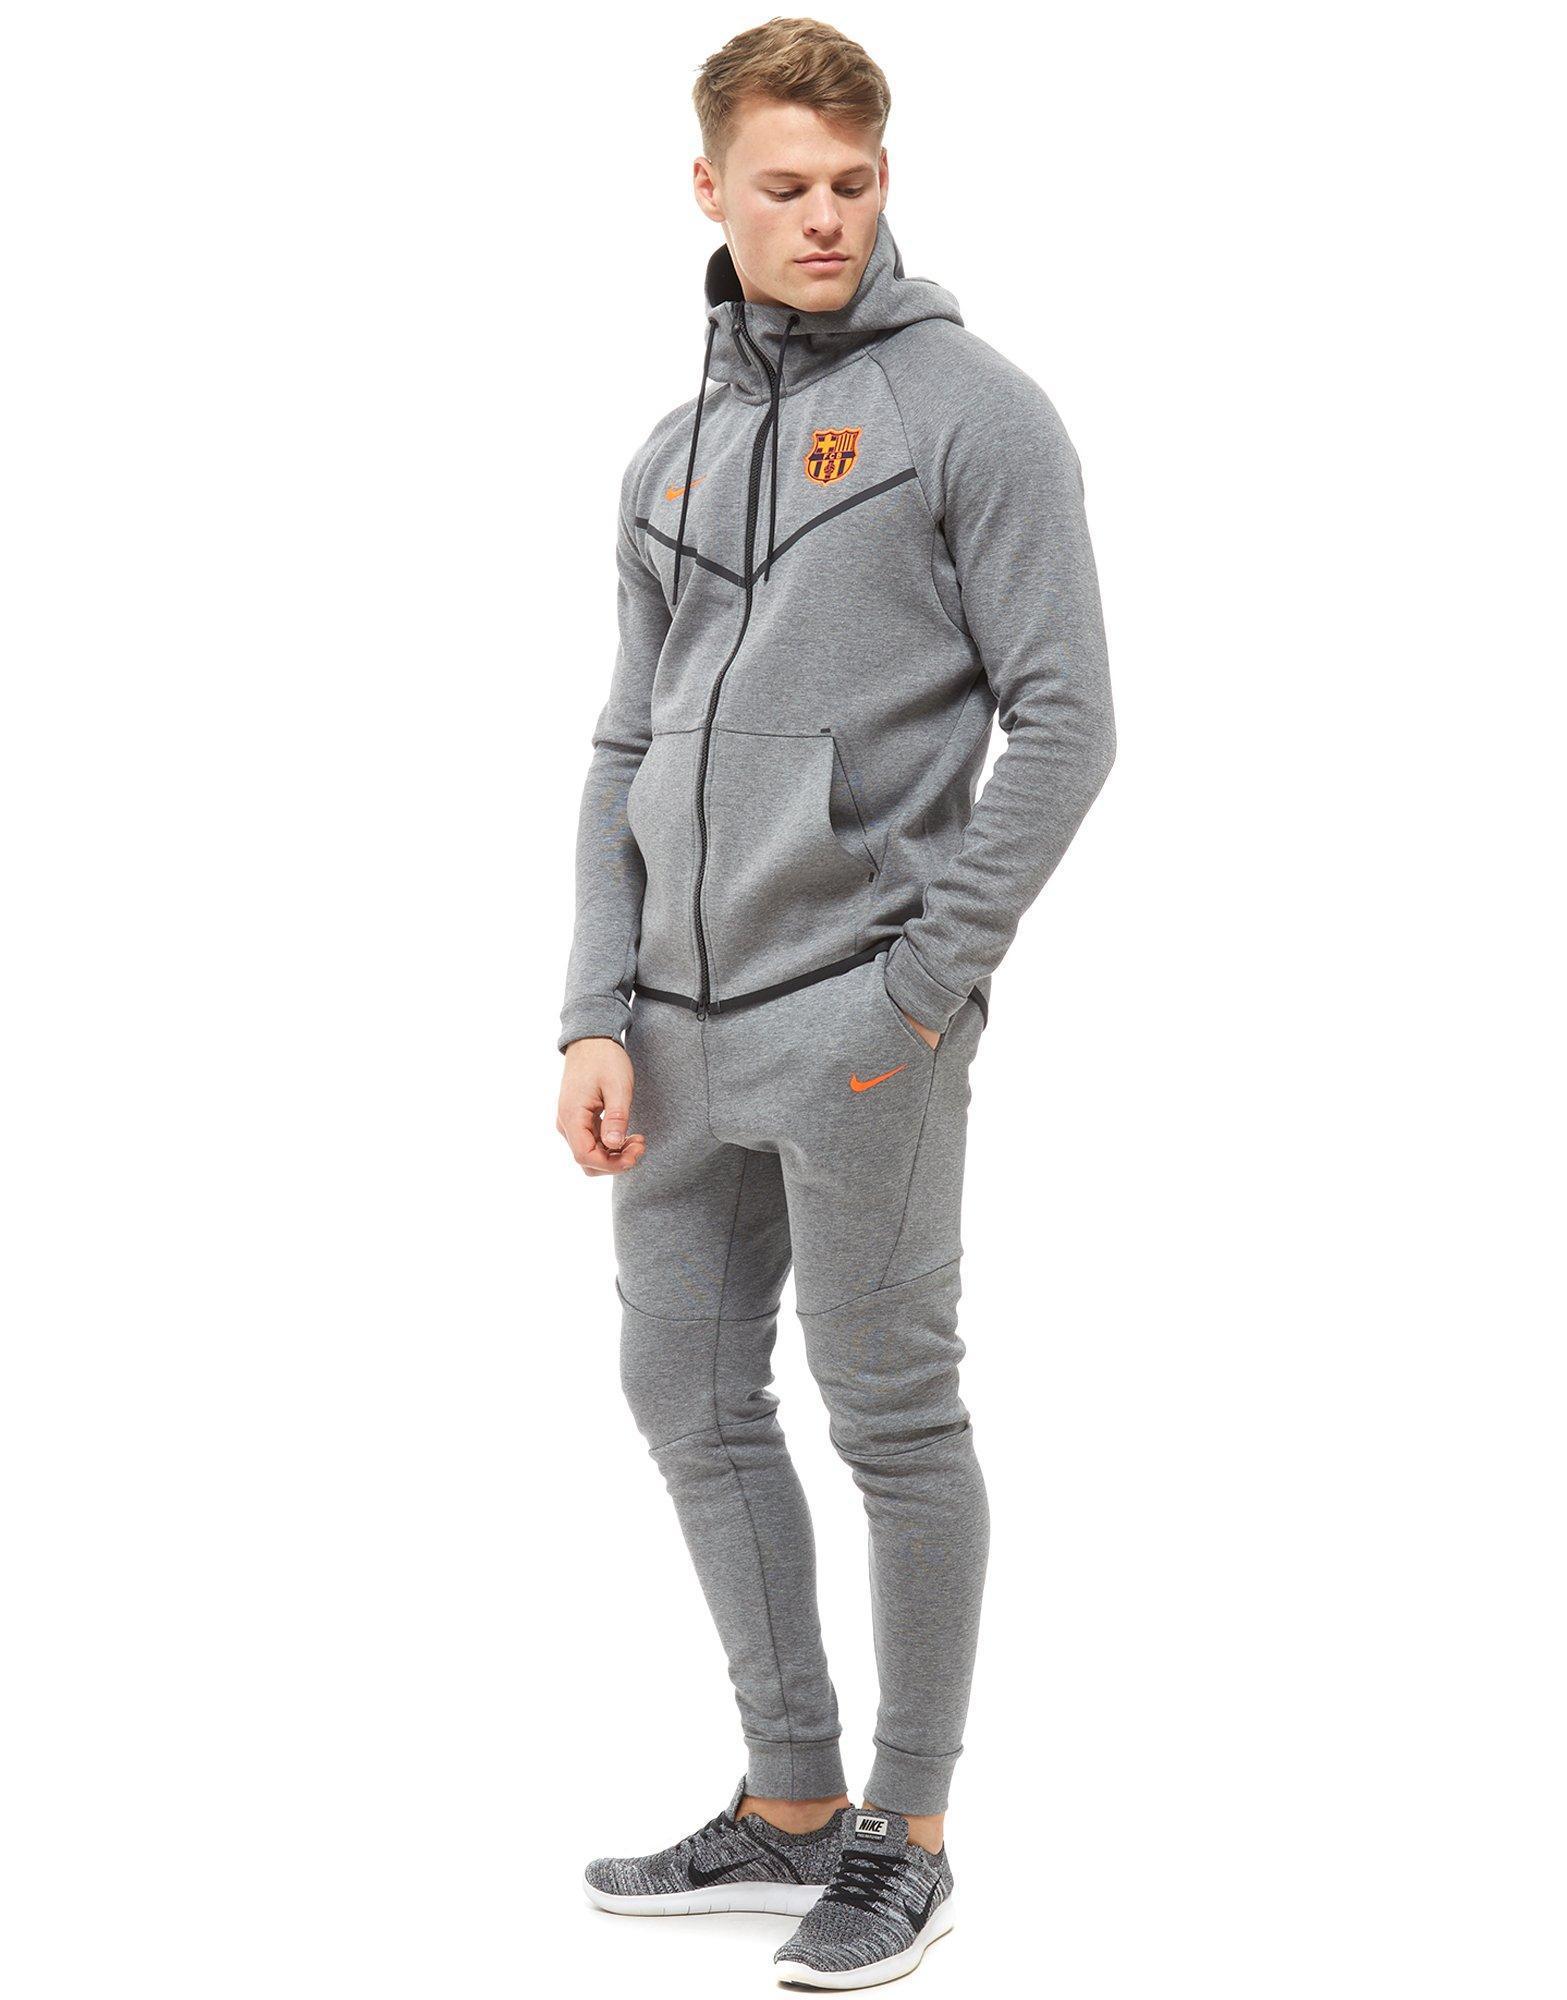 Lyst - Nike Fc Barcelona Tech Hoodie in Gray for Men a849df1f9bed